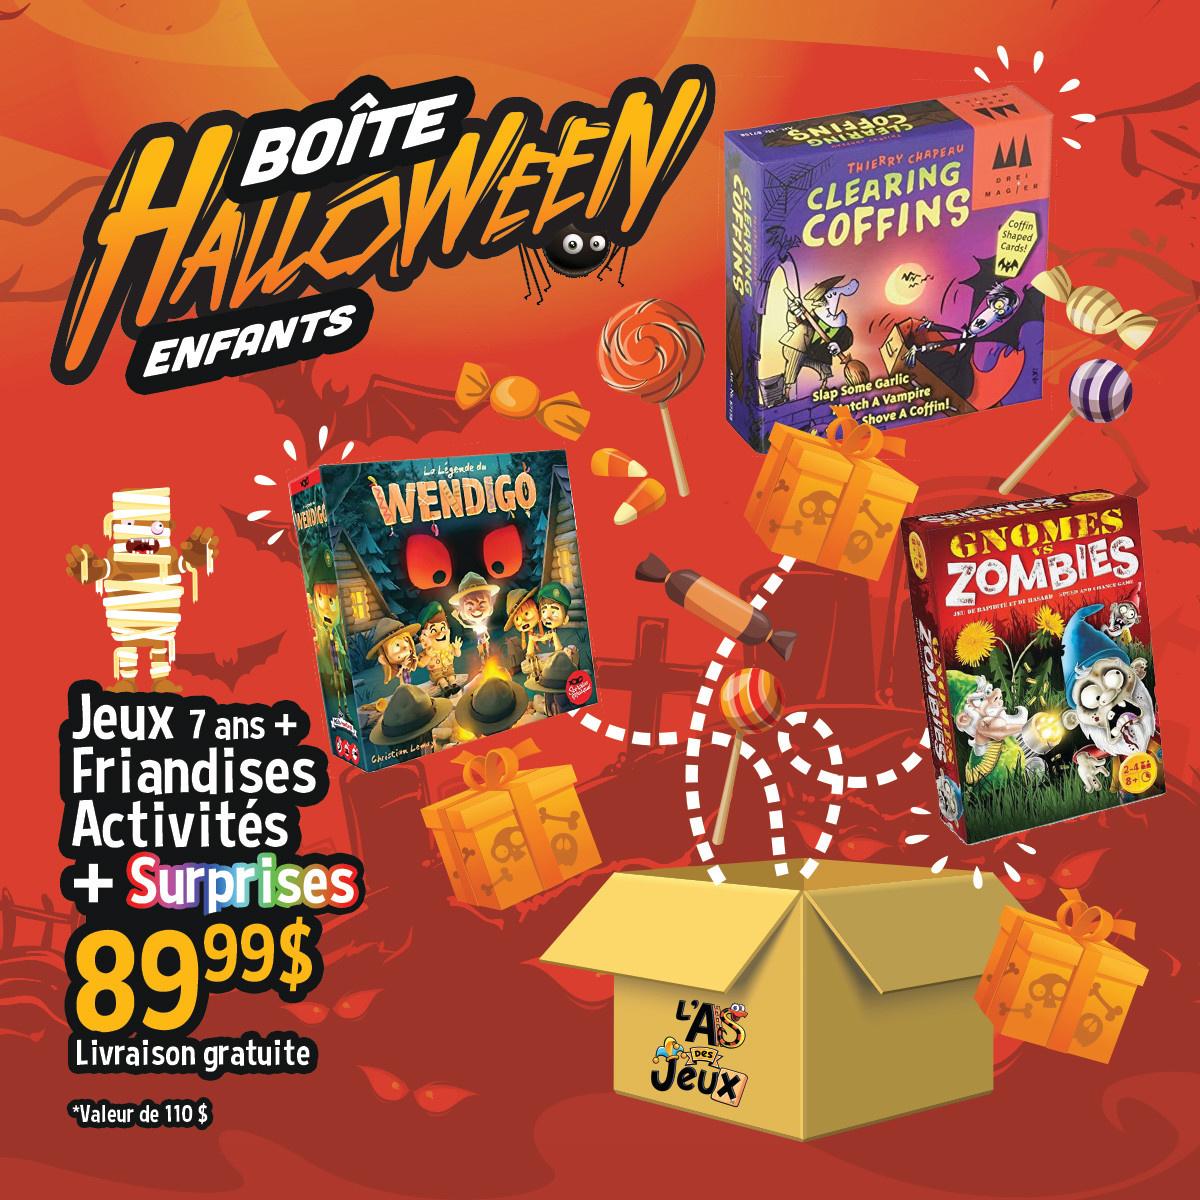 Boîte Halloween - Enfants